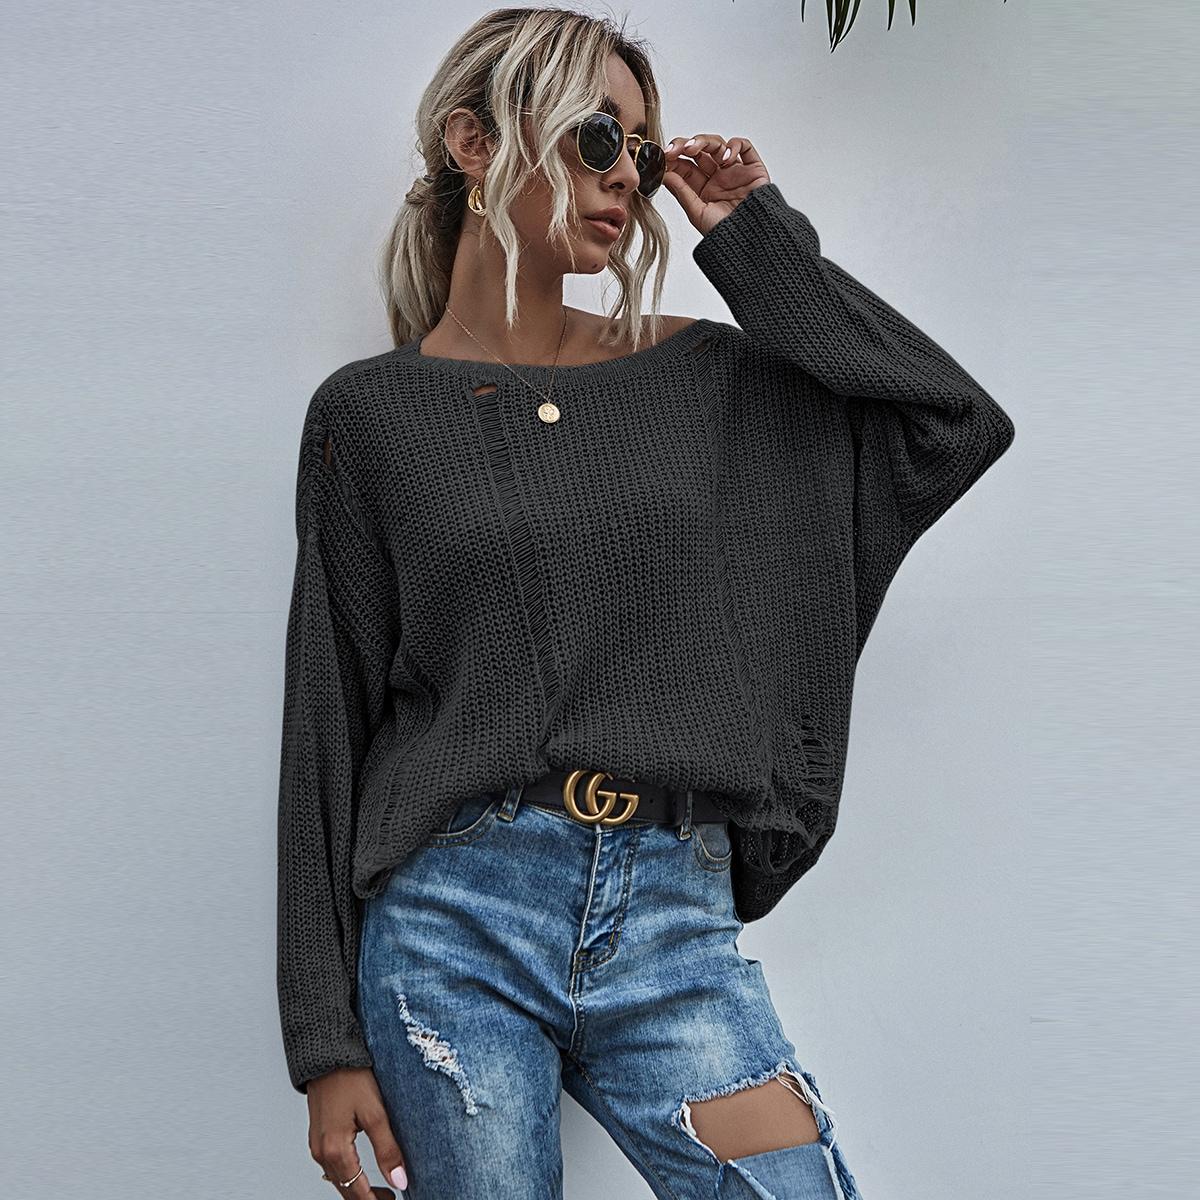 Рваный свитер оверсайз